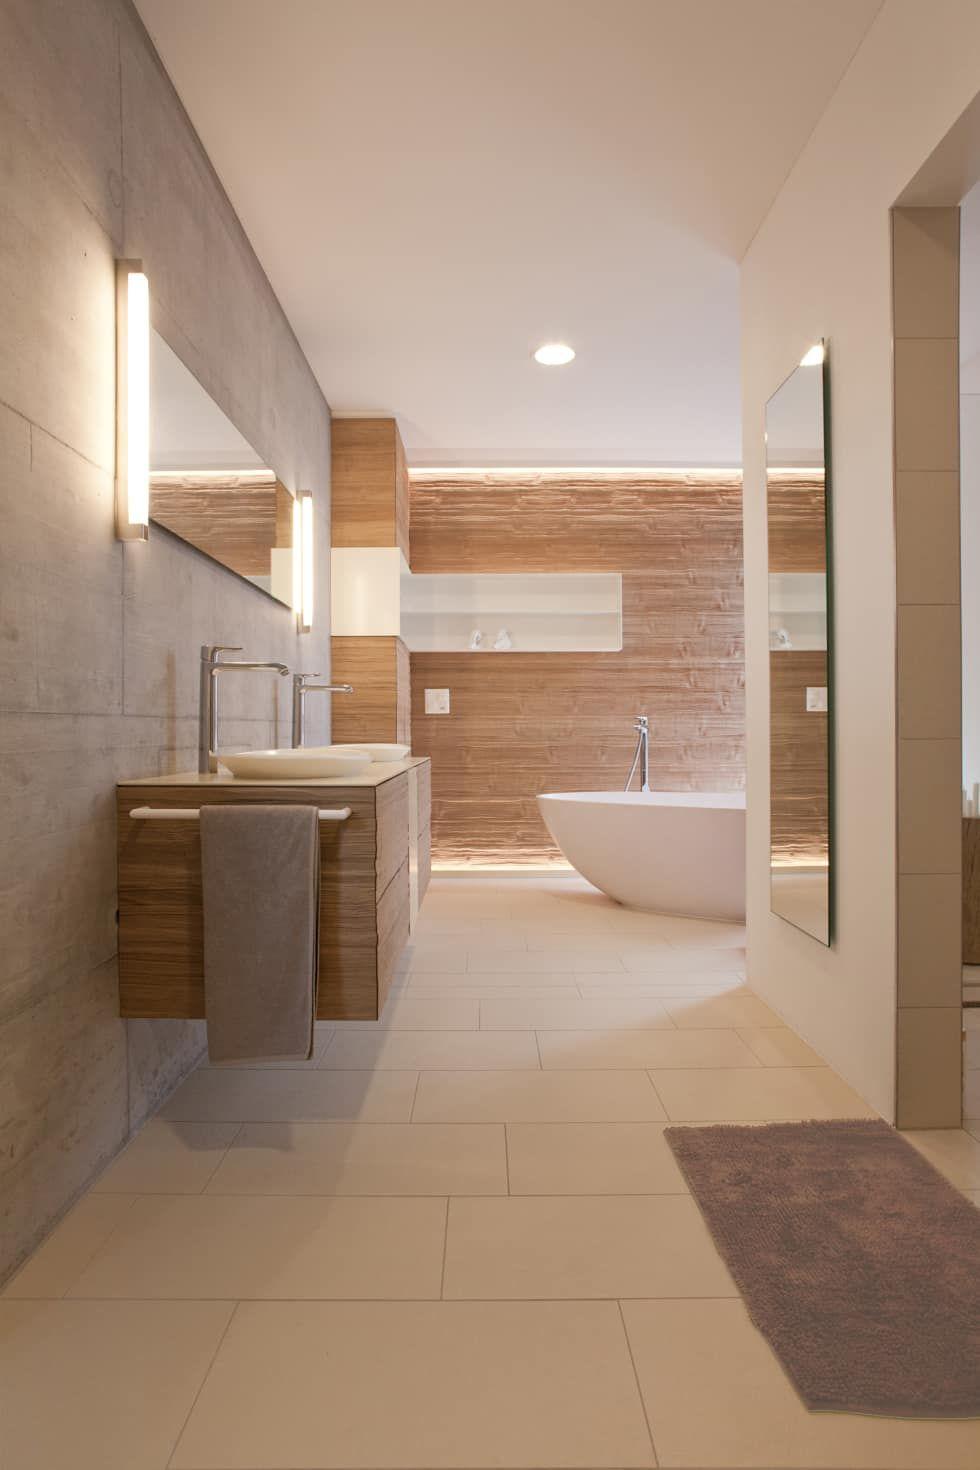 badumbau i l ngwies moderne badezimmer von einfall7 gmbh in 2018 bad pinterest badezimmer. Black Bedroom Furniture Sets. Home Design Ideas